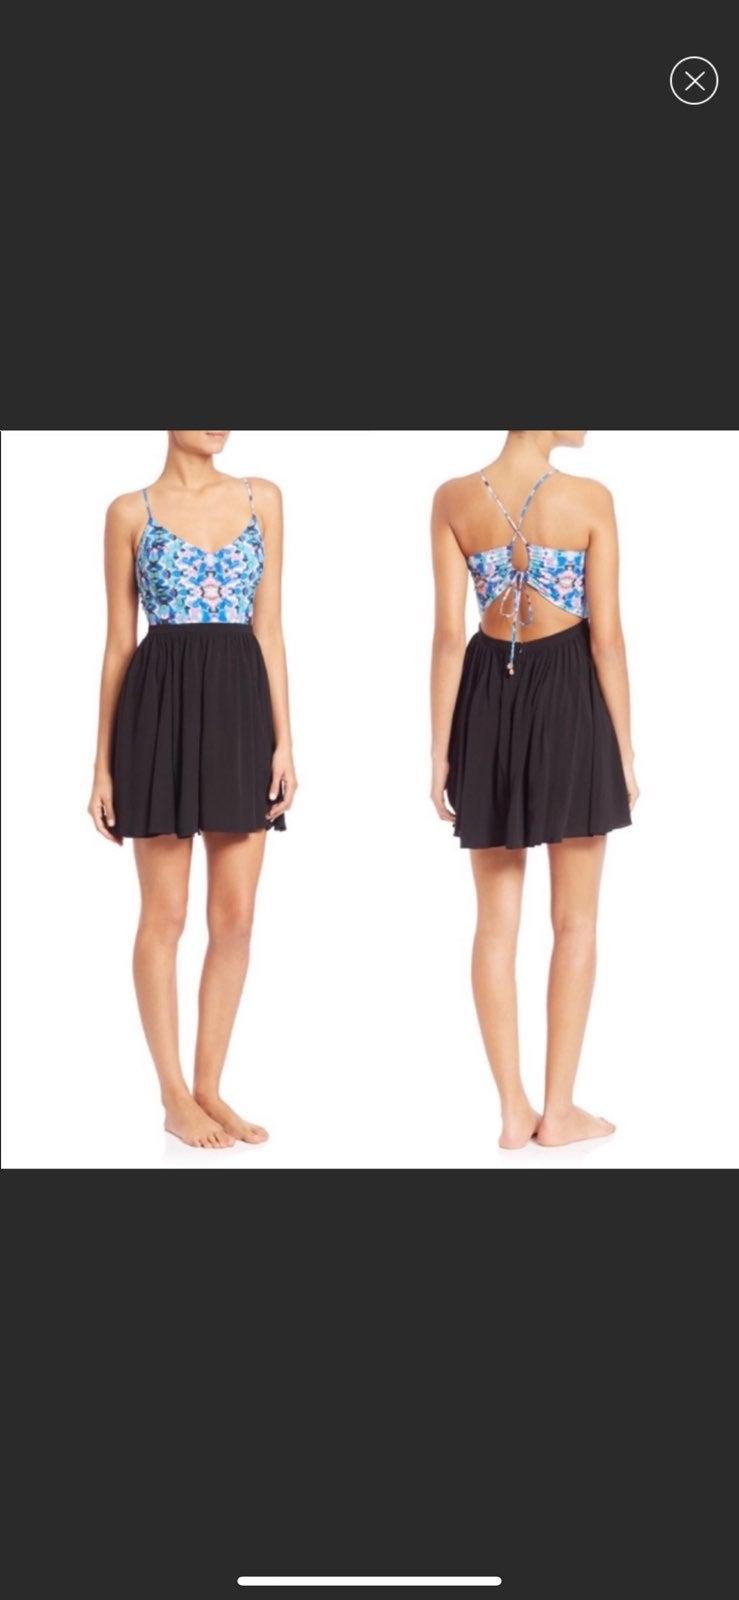 6 shore road pacific floral beach dress